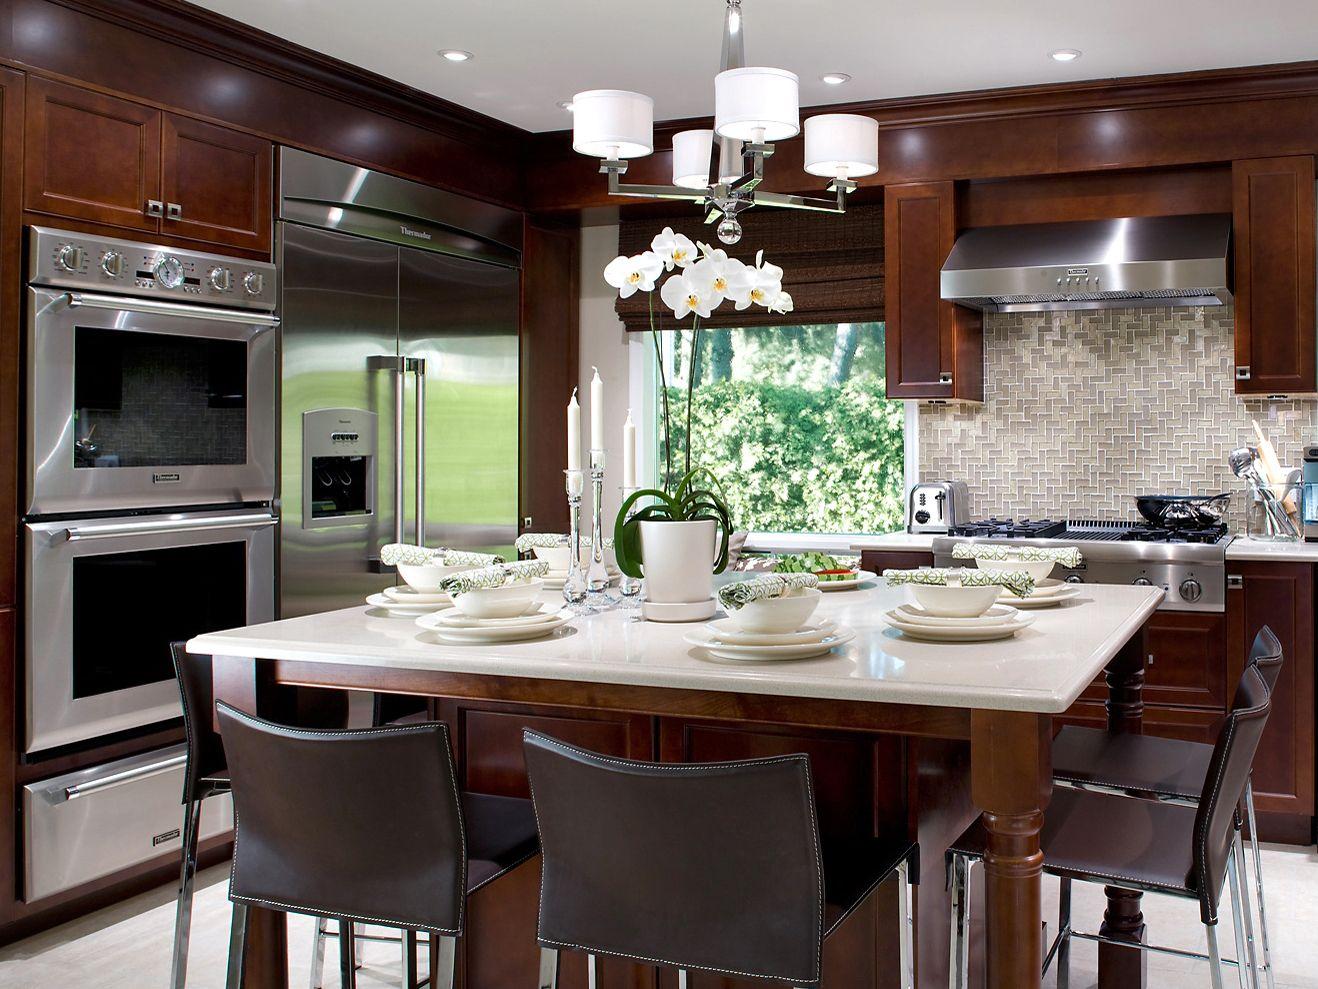 Merveilleux HGTV Kitchen Design | Kitchen Design Guide: Kitchen Colors, Remodeling Ideas,  Decorating .